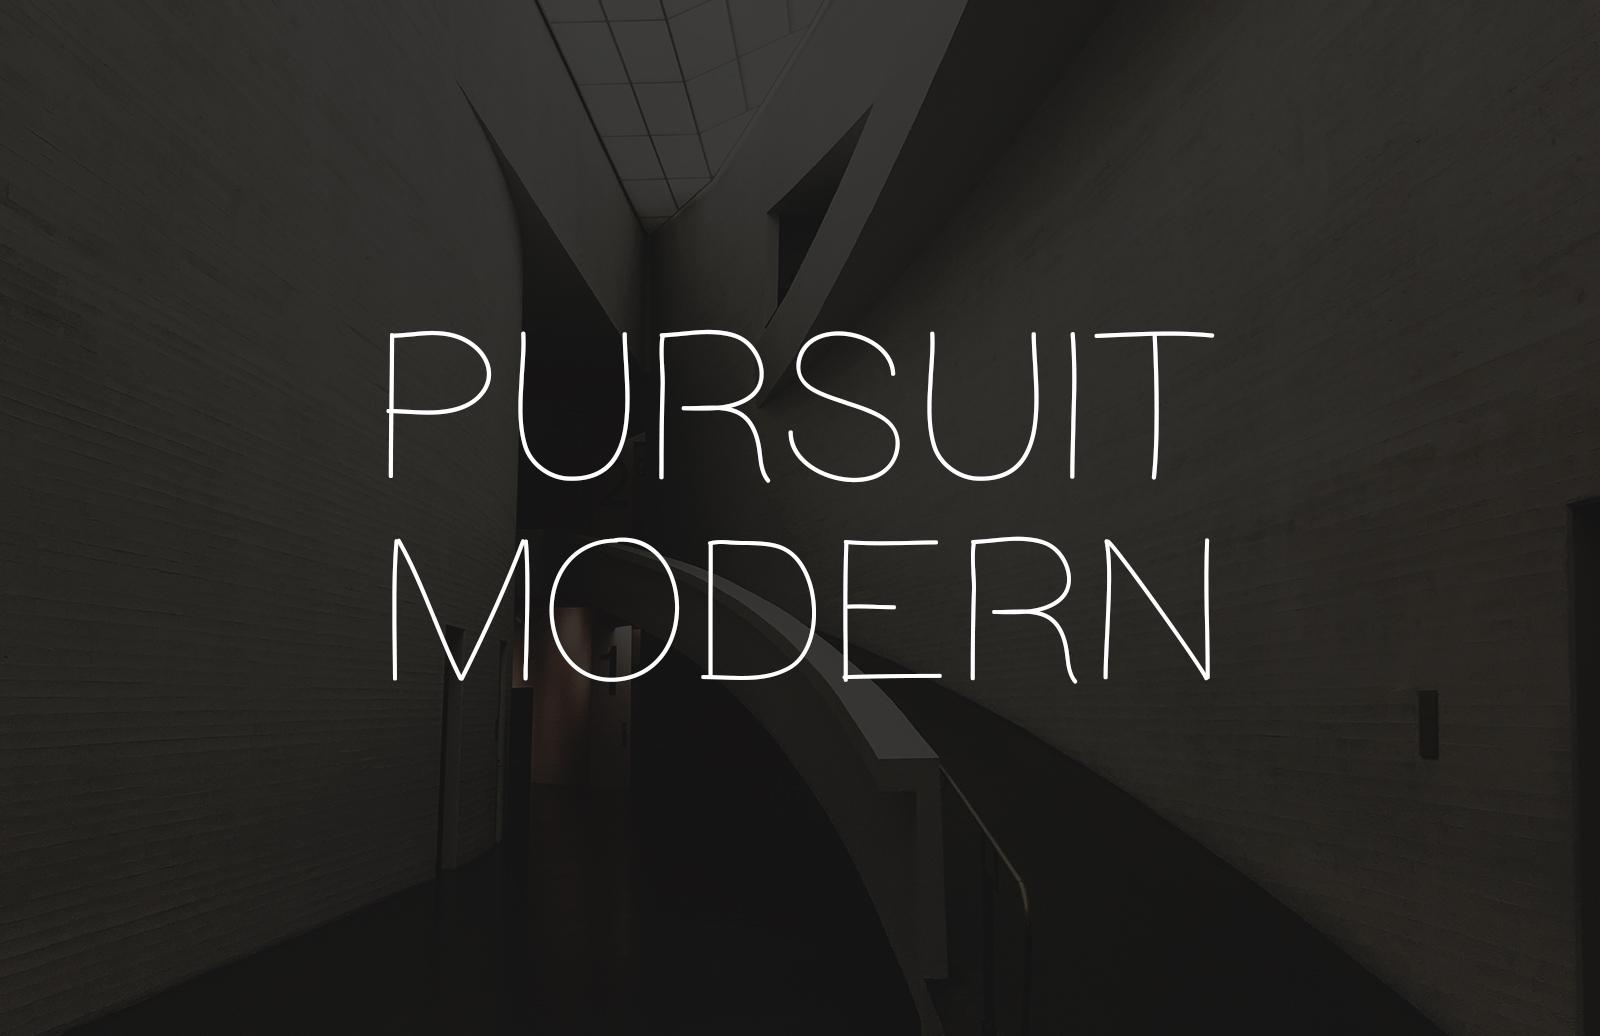 Pursuit  Modern  Preview 1